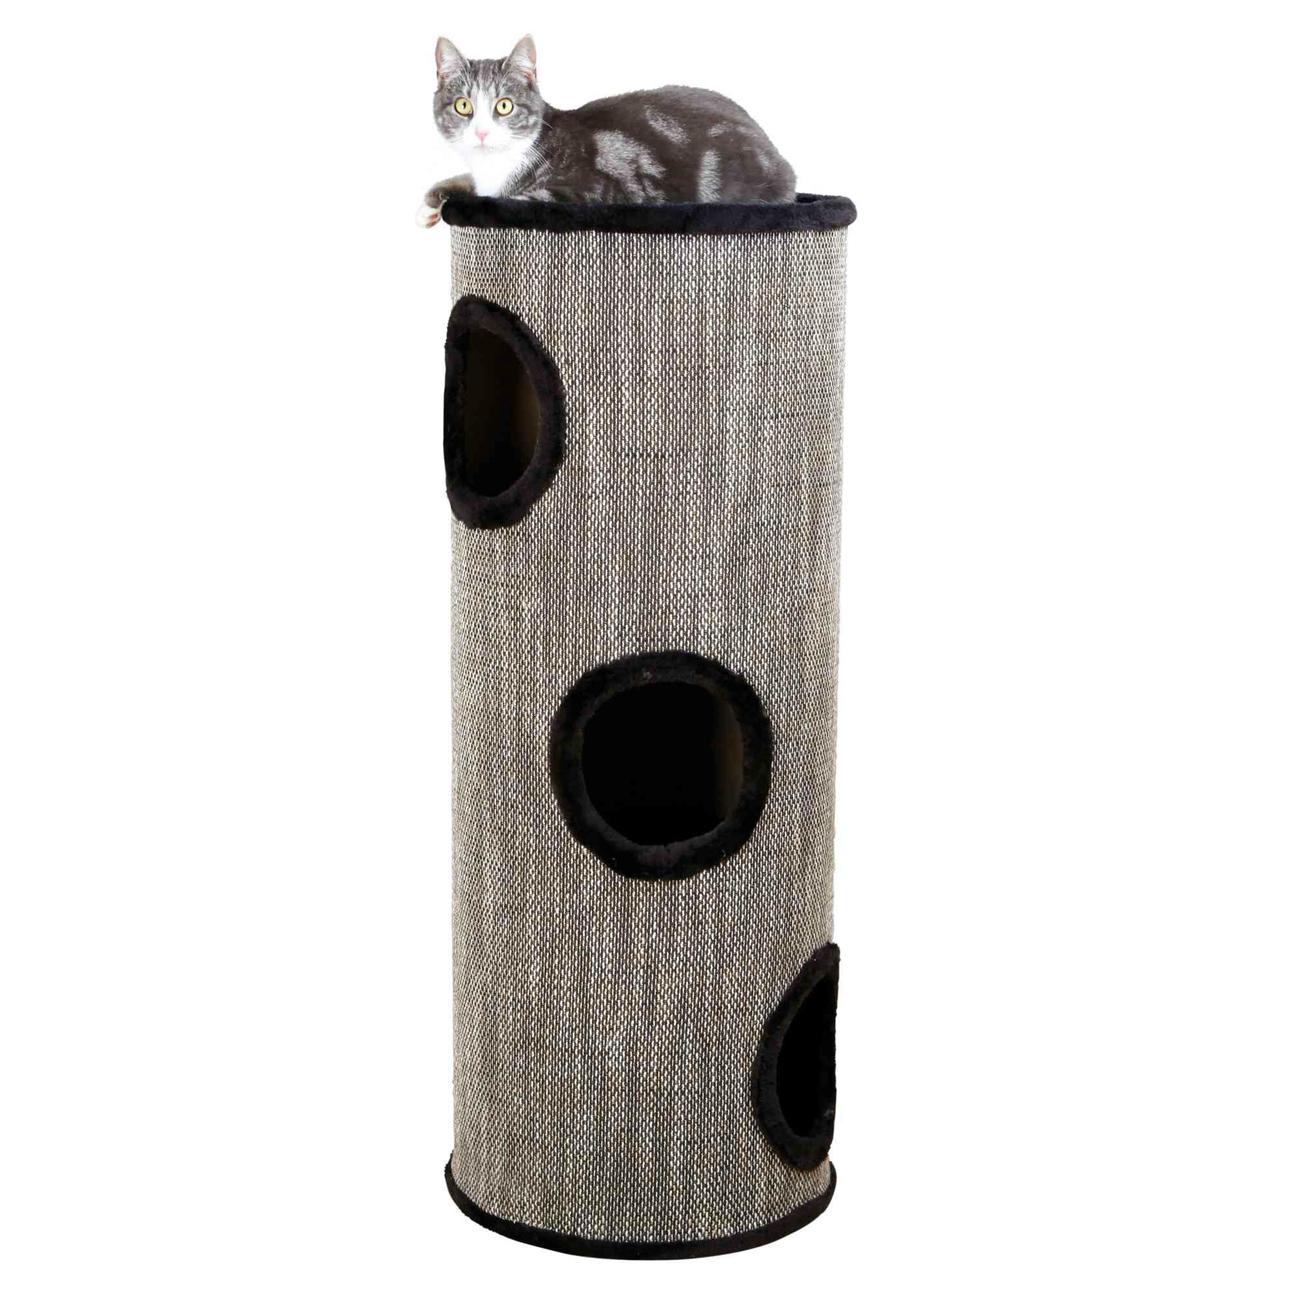 TRIXIE Cat Tower Amado Katzenturm Preview Image